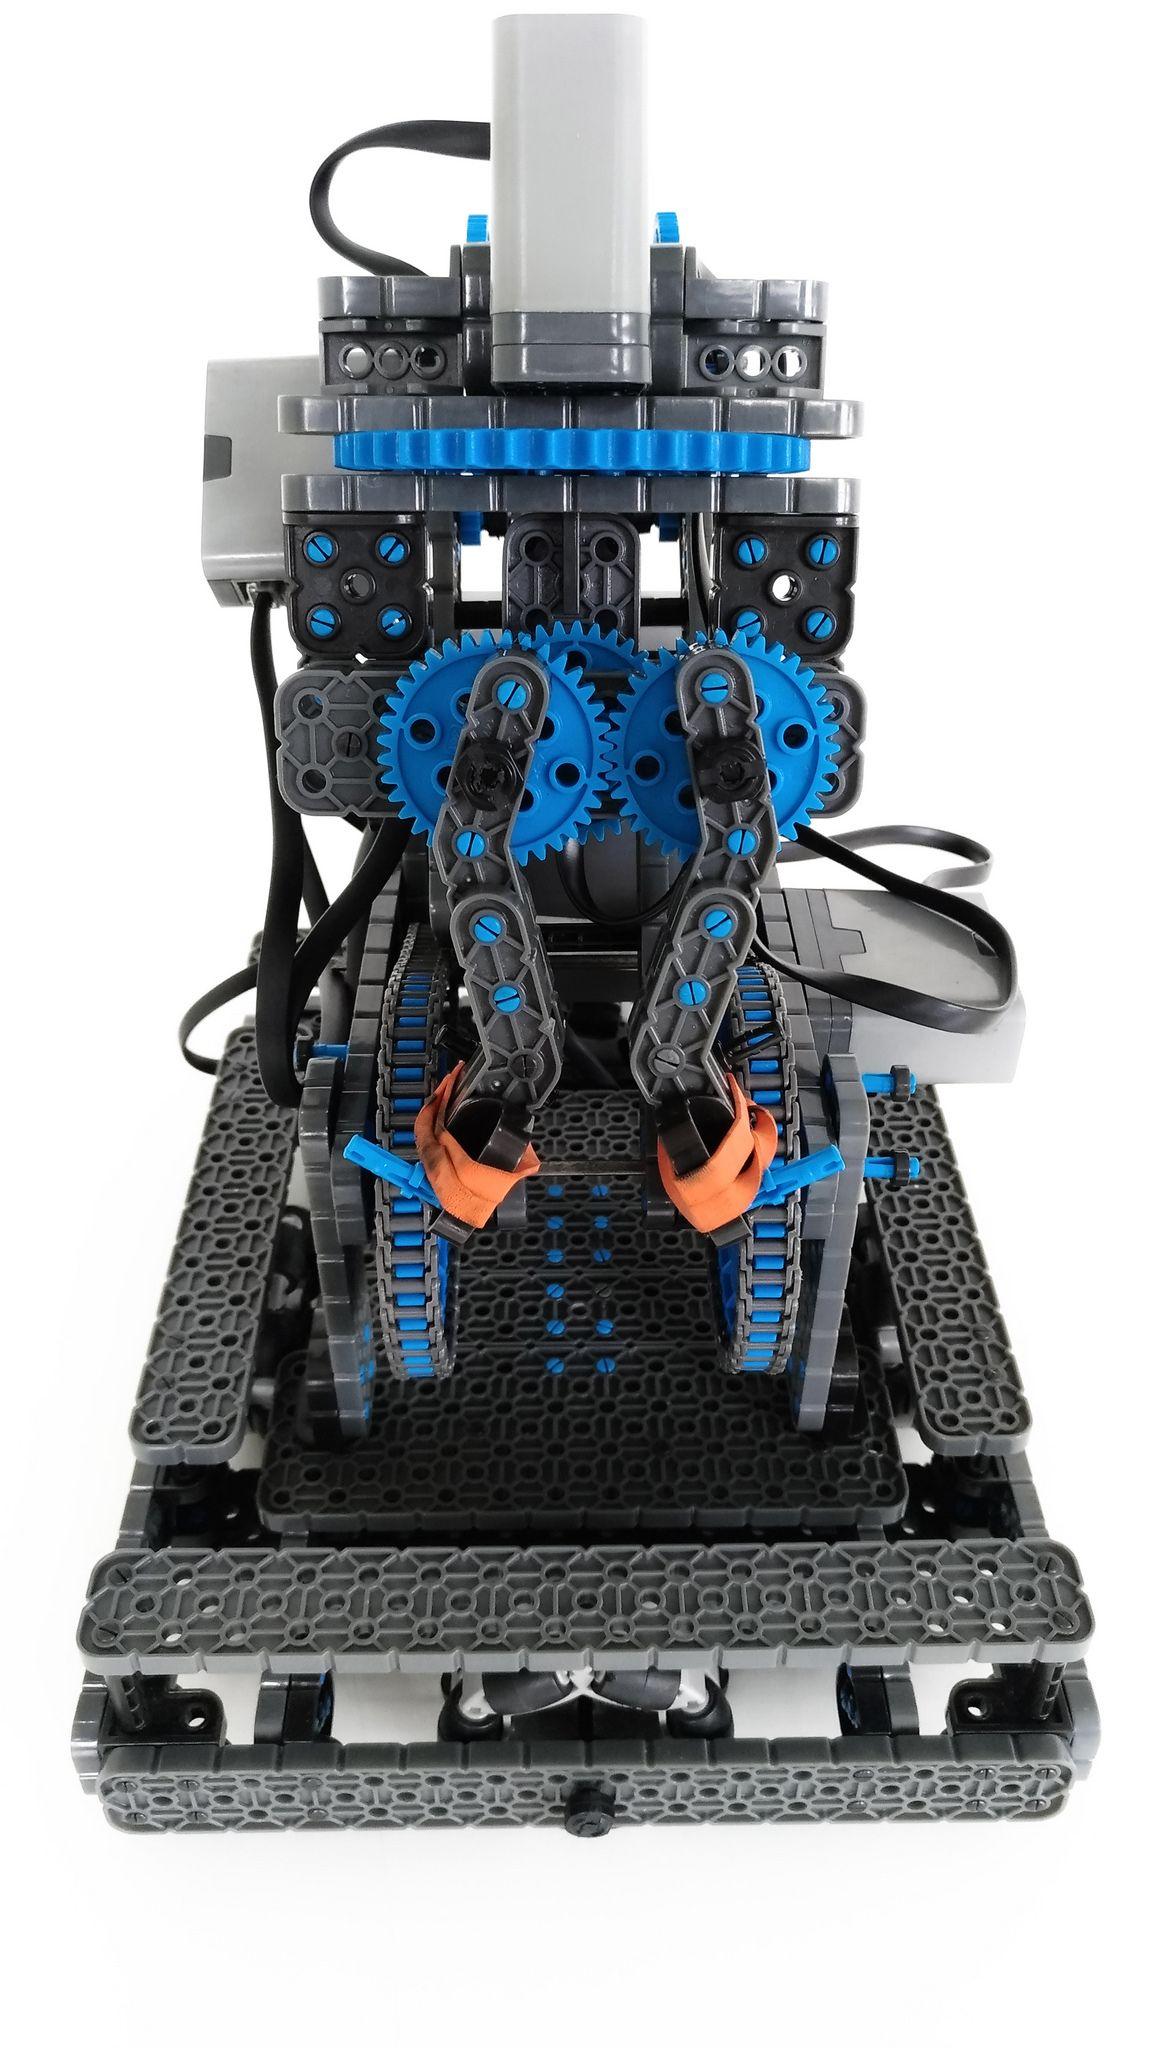 Vex Iq Robotics Design Robot K Robotics Pinterest Robot